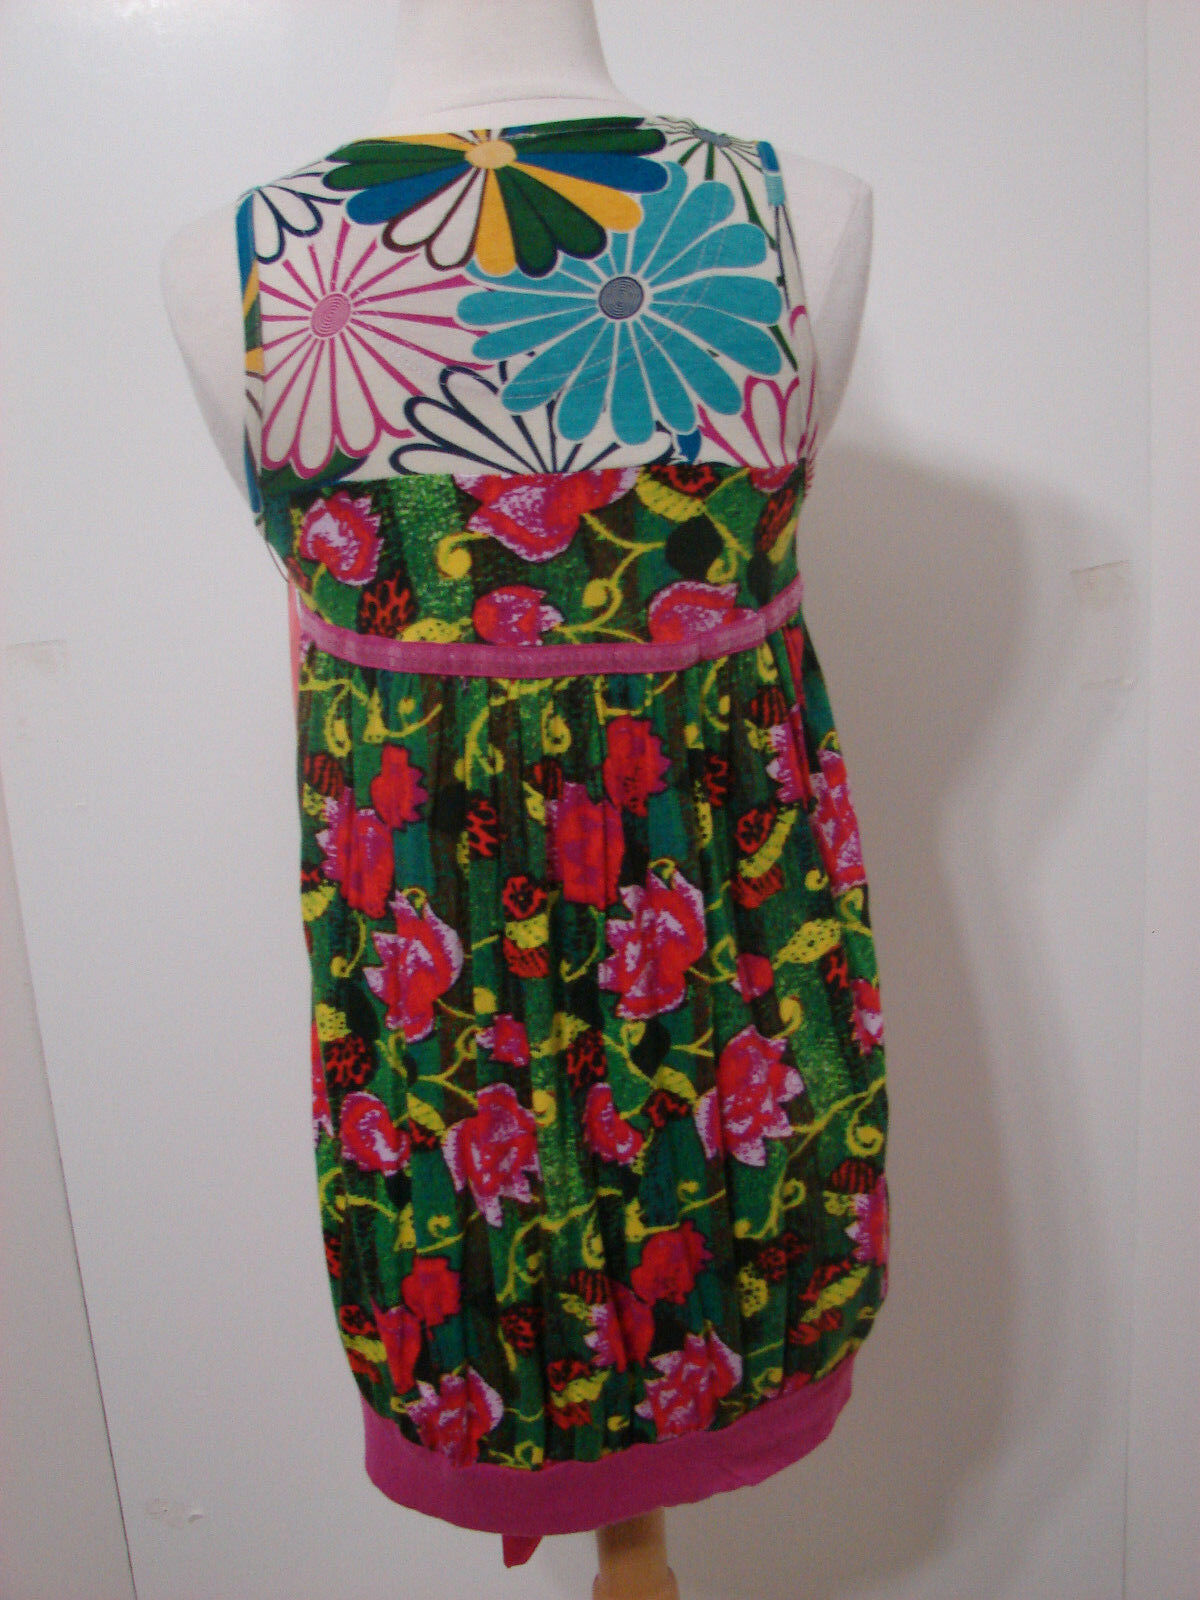 DESIGUAL DESIGUAL DESIGUAL Multi-colord Floral Sequin Satin Tie Sleeveless Dress M NWOT India cb9ca9